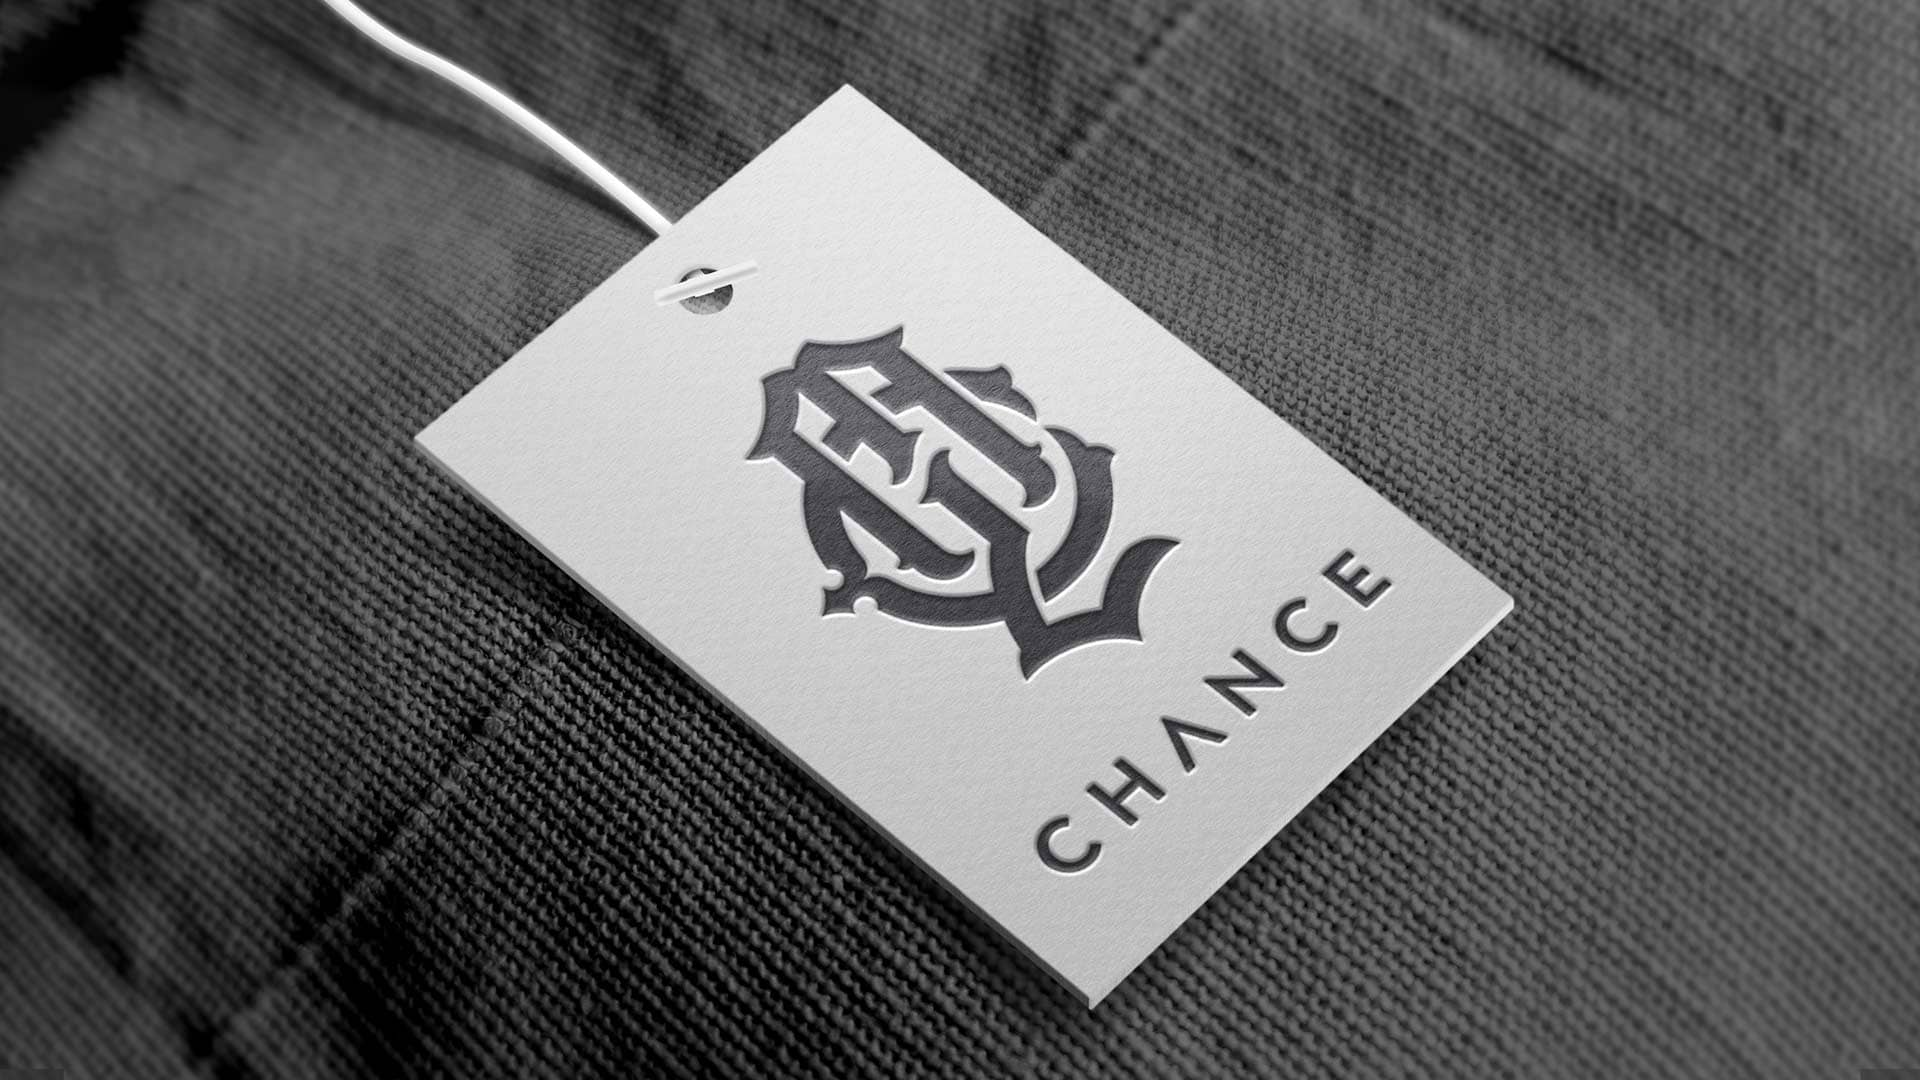 My Last Chance - Apparel Branding Clothing Tag